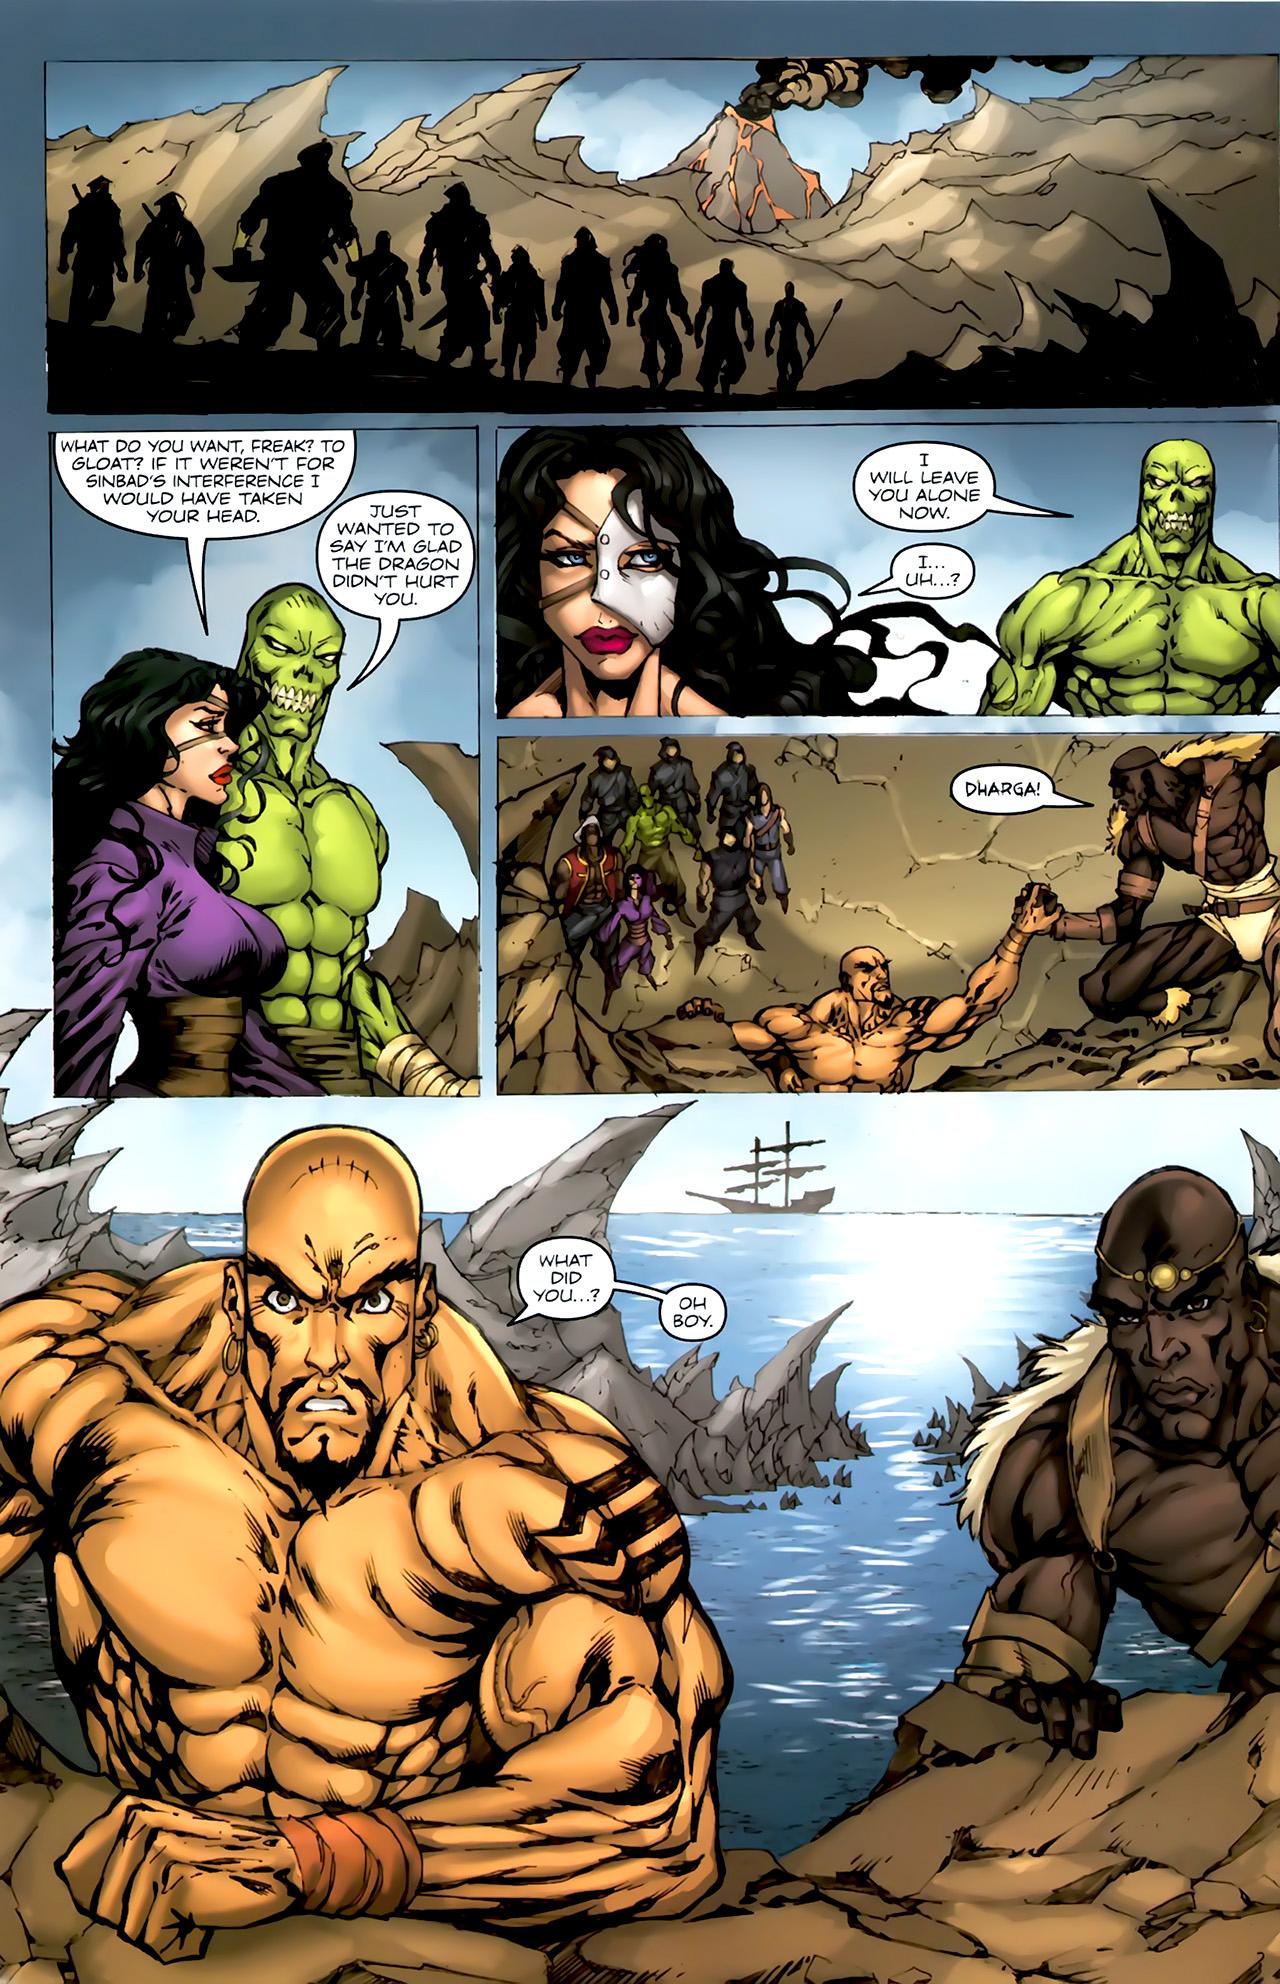 Read online 1001 Arabian Nights: The Adventures of Sinbad comic -  Issue #4 - 7